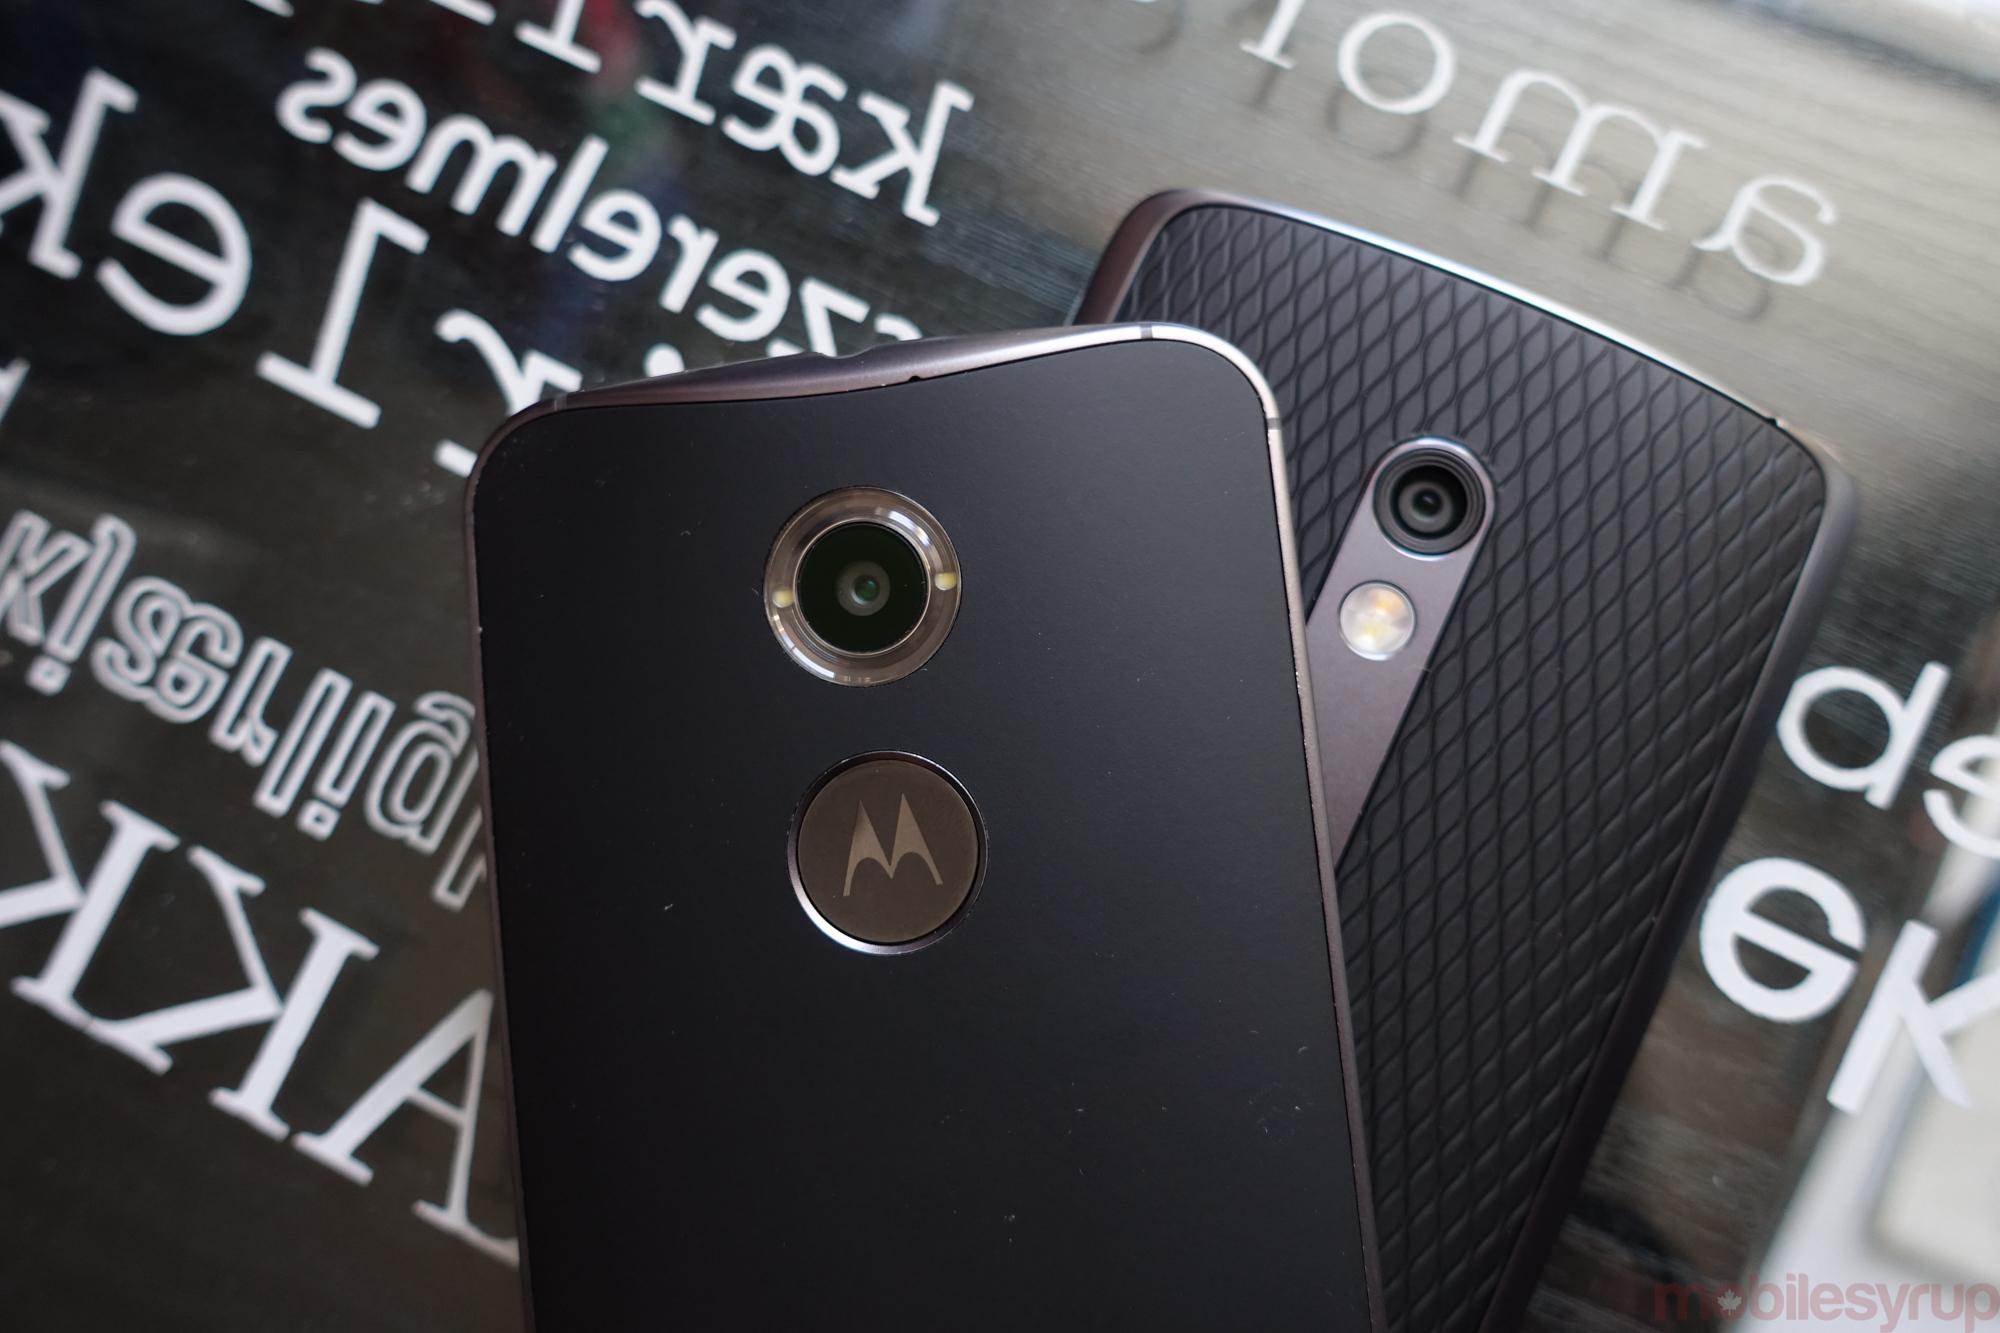 Moto Play and Moto X